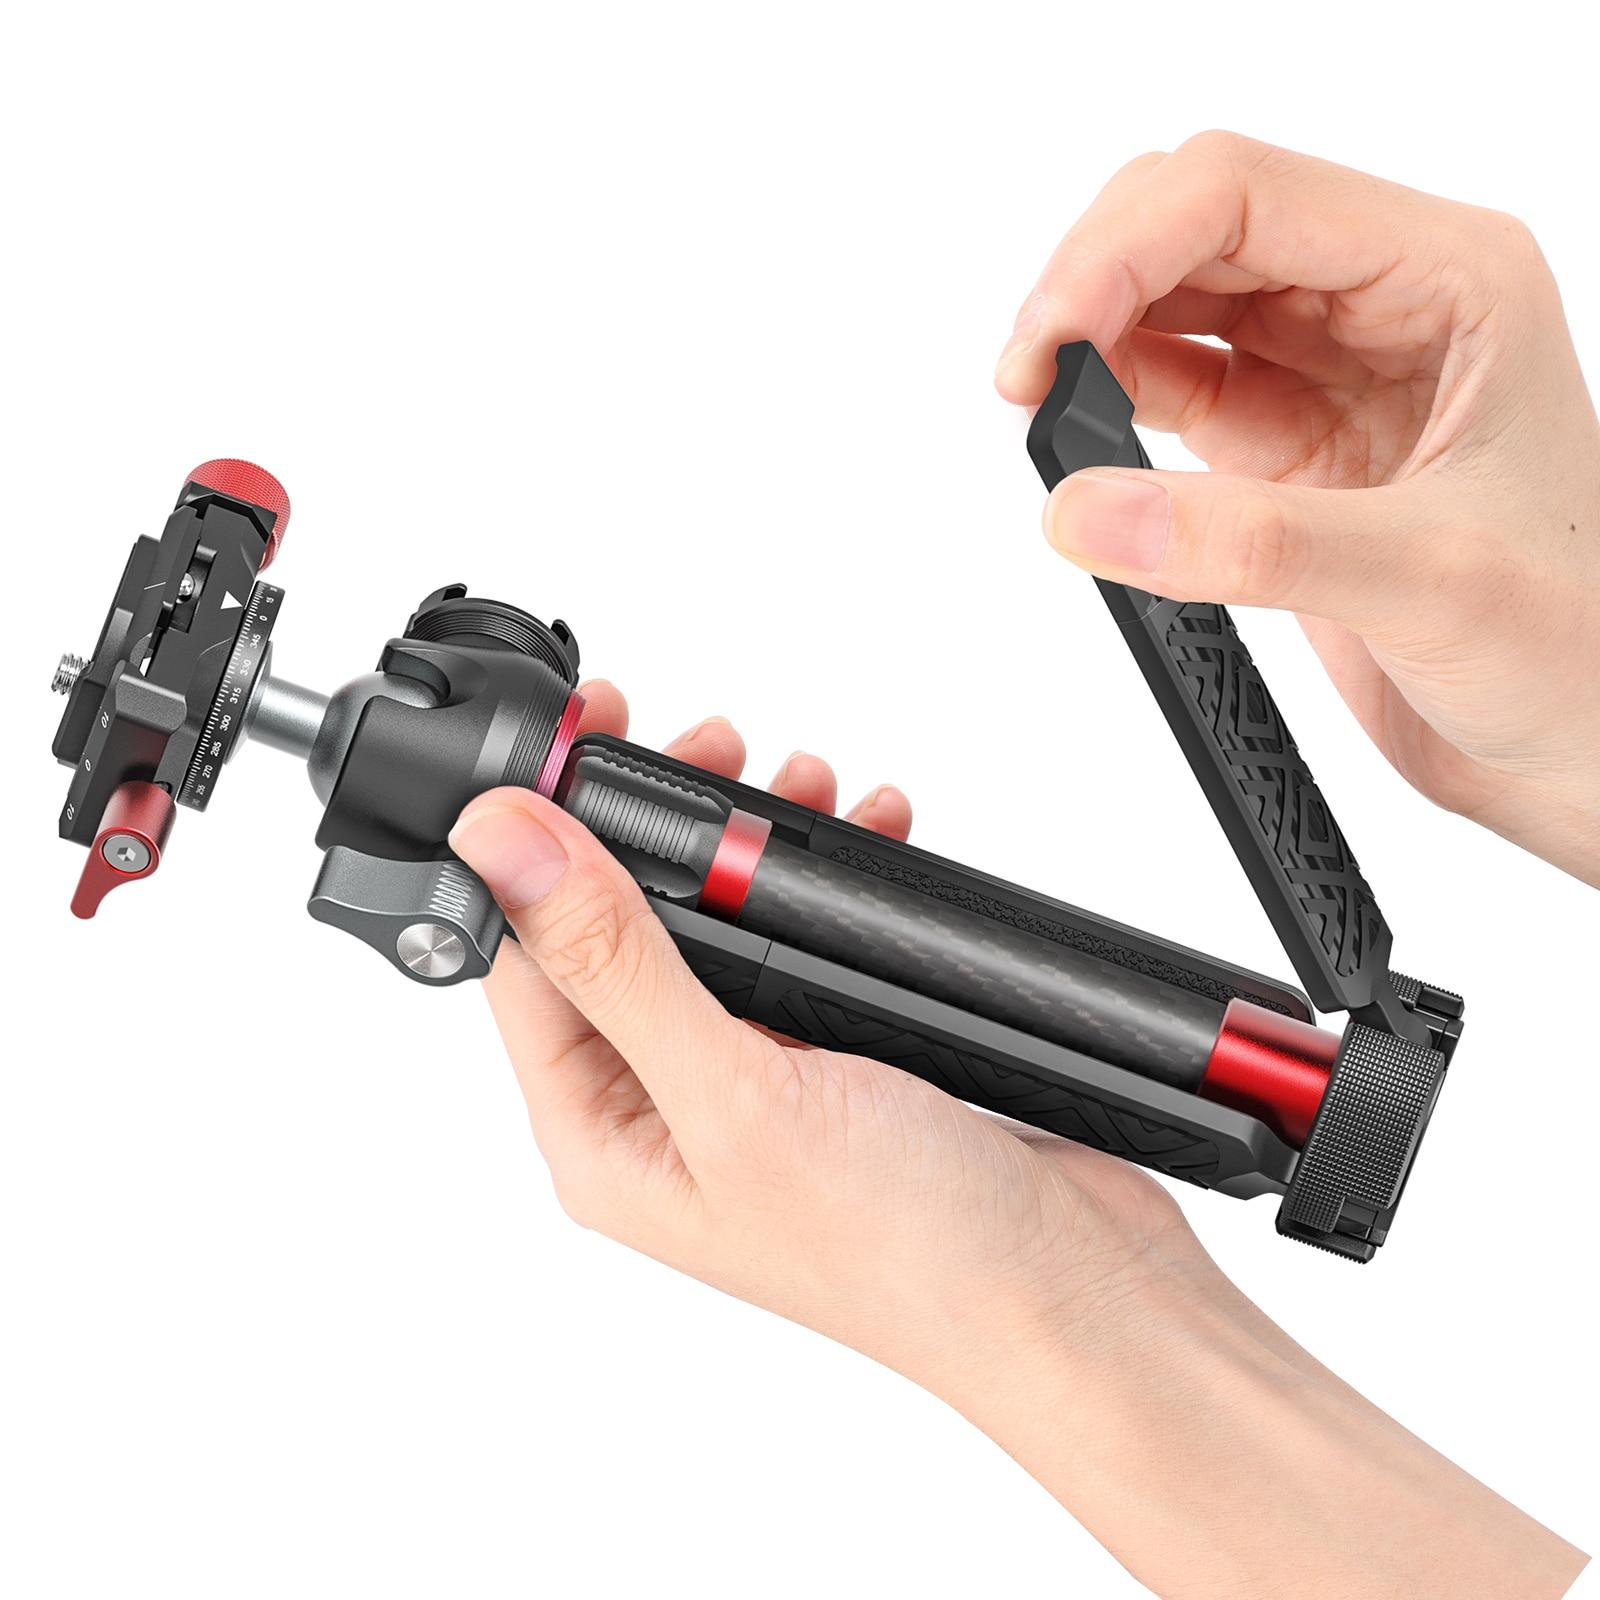 MT-43 Metal Tripod Camera Vlogging Studio Kits Video Shooting Selfie Stick Photography With Ballhead Cold Shoe Tripod enlarge